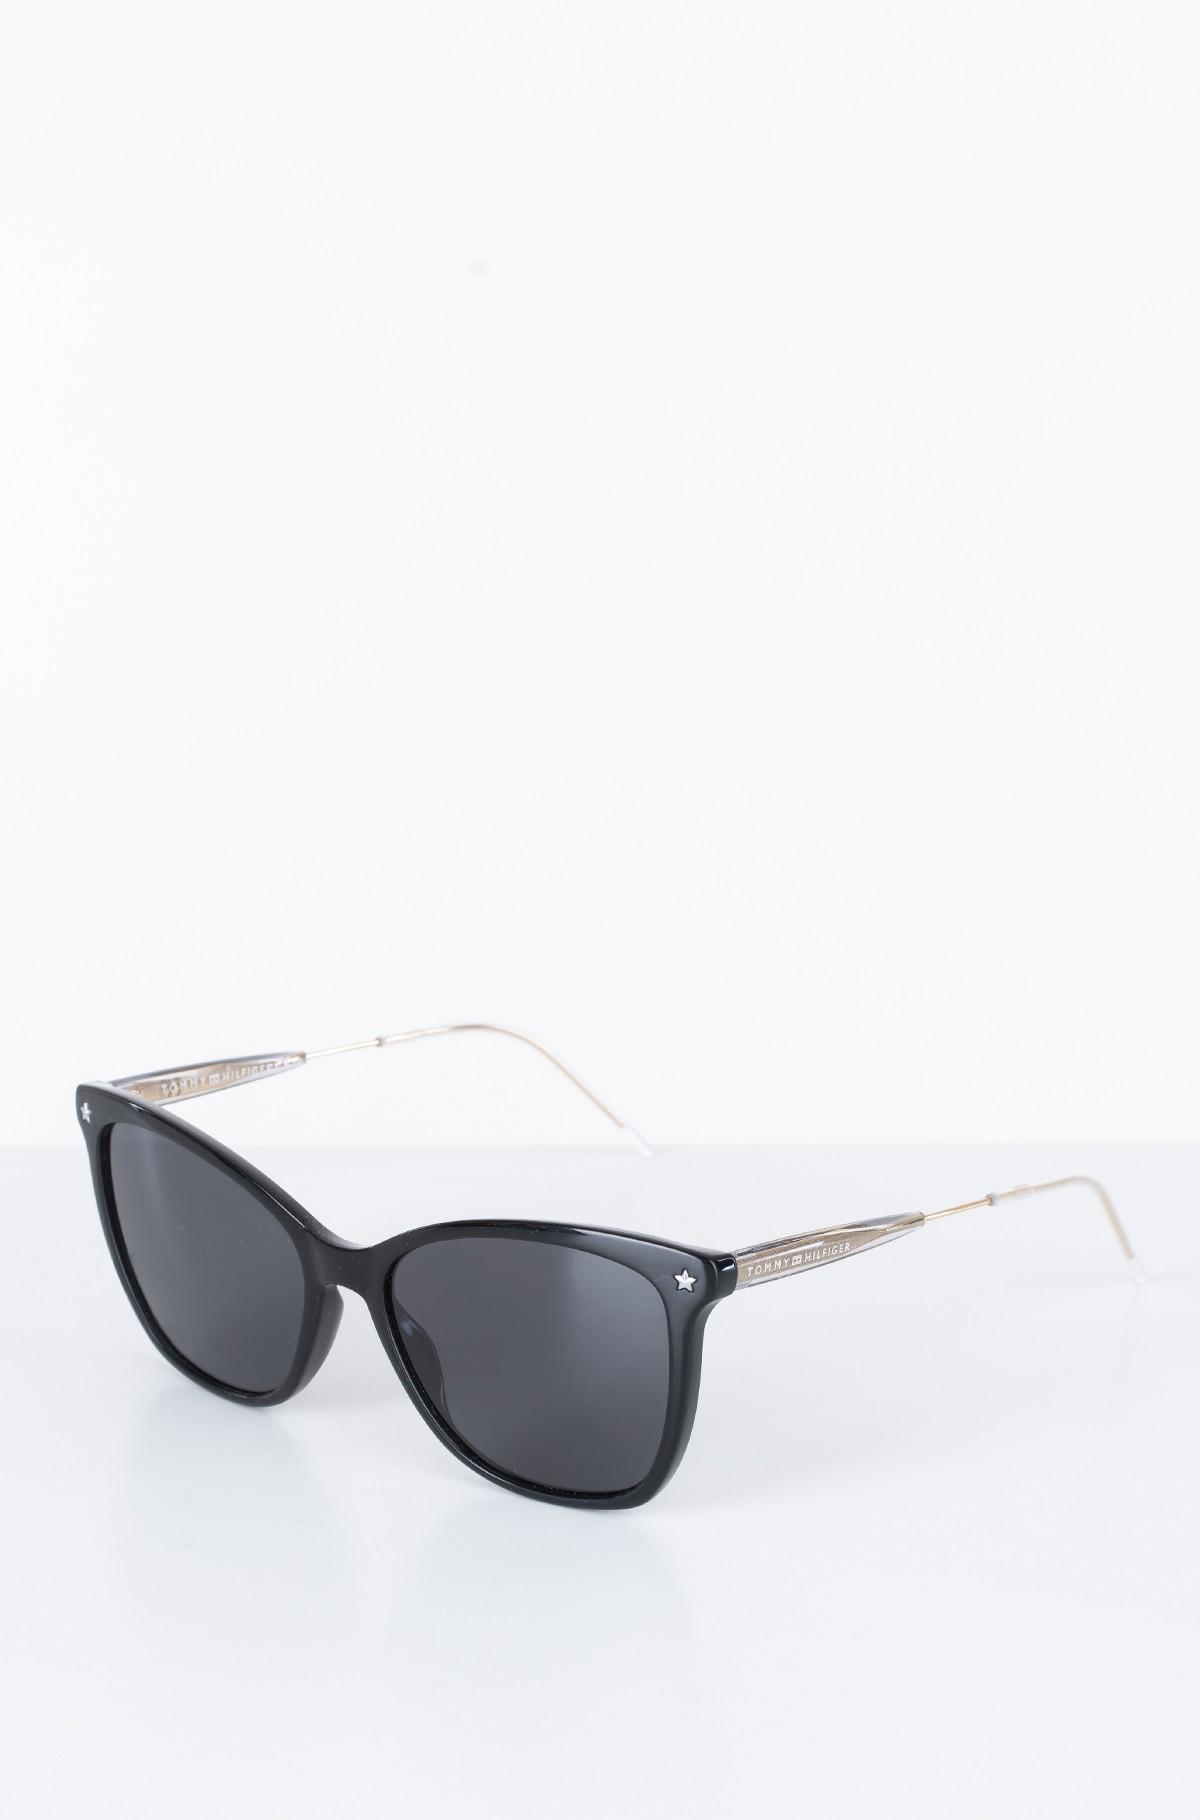 Sunglasses 1647/S-full-1